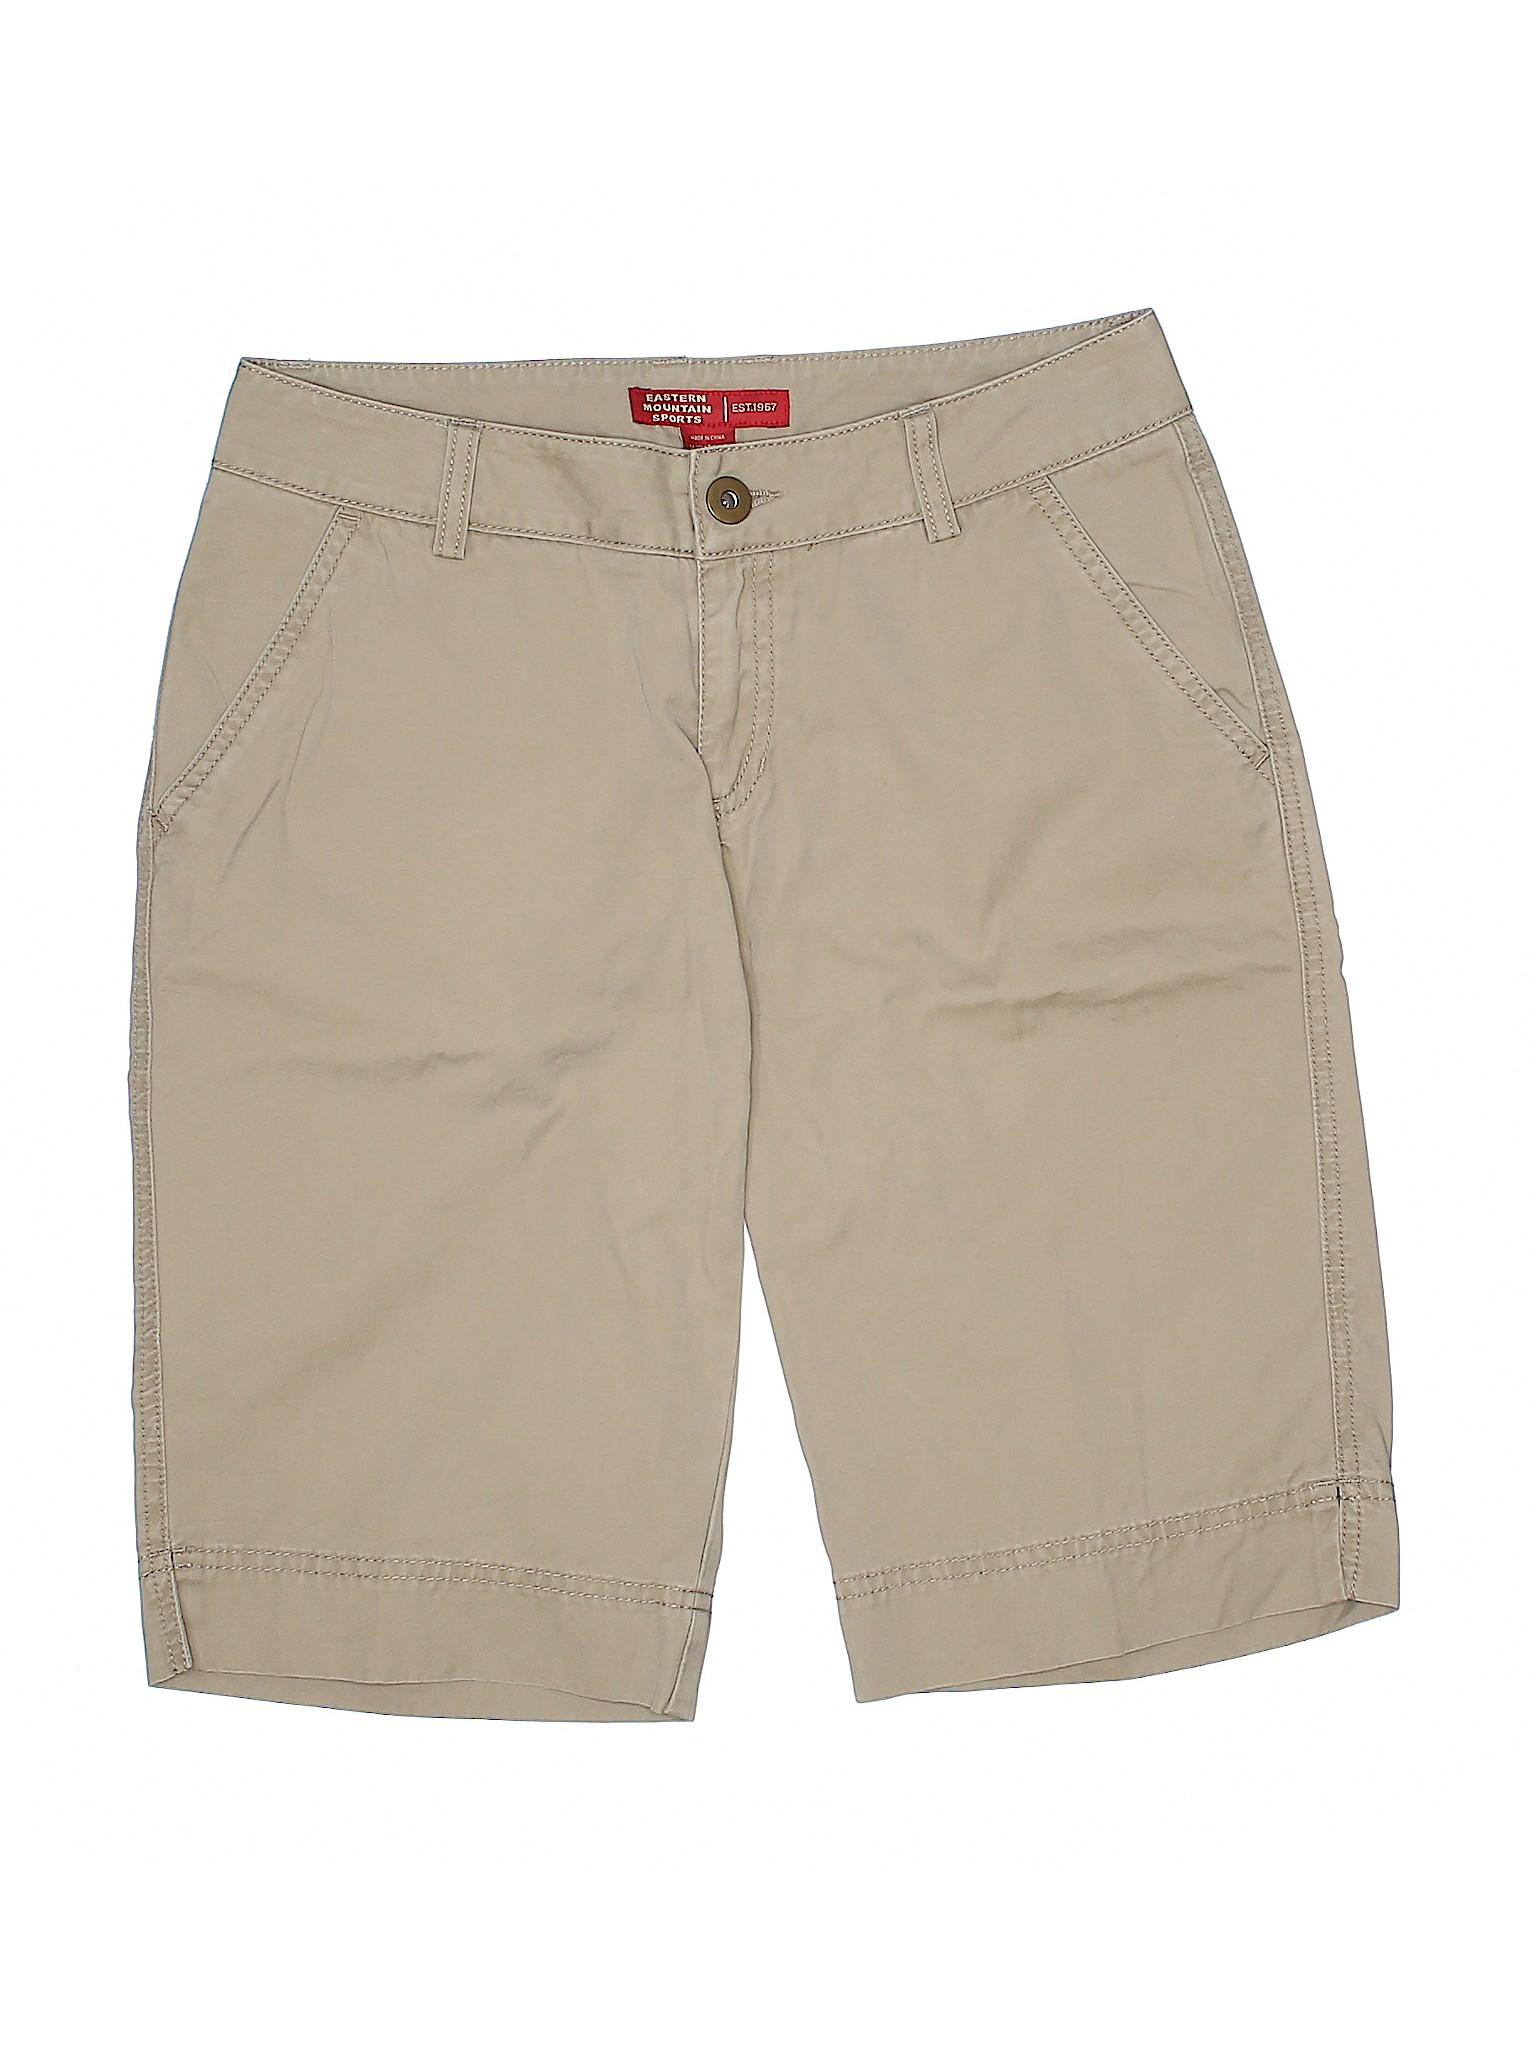 Khaki Shorts Sports Mountain Eastern Boutique zx0Cpp